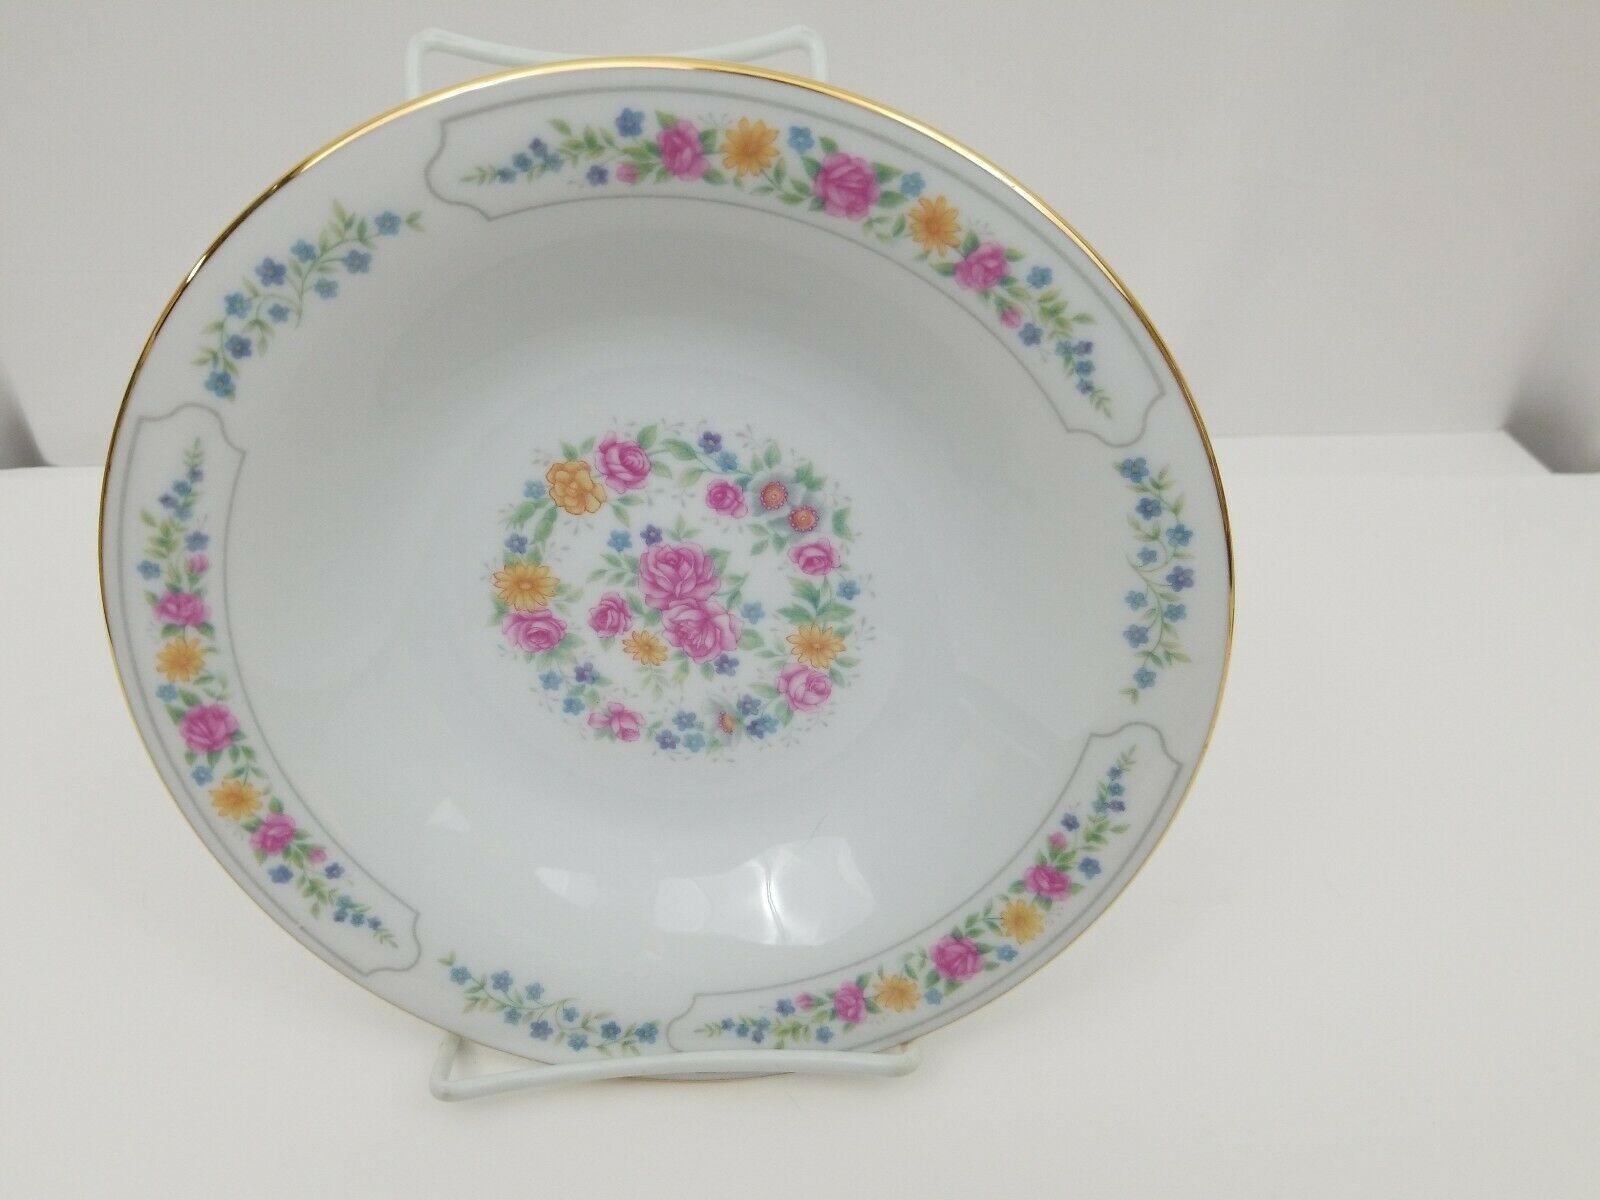 Liling Fine China Cereal Soup Bowls Set of 4 Yung Shen White Roses Keepsake 8.25 image 7